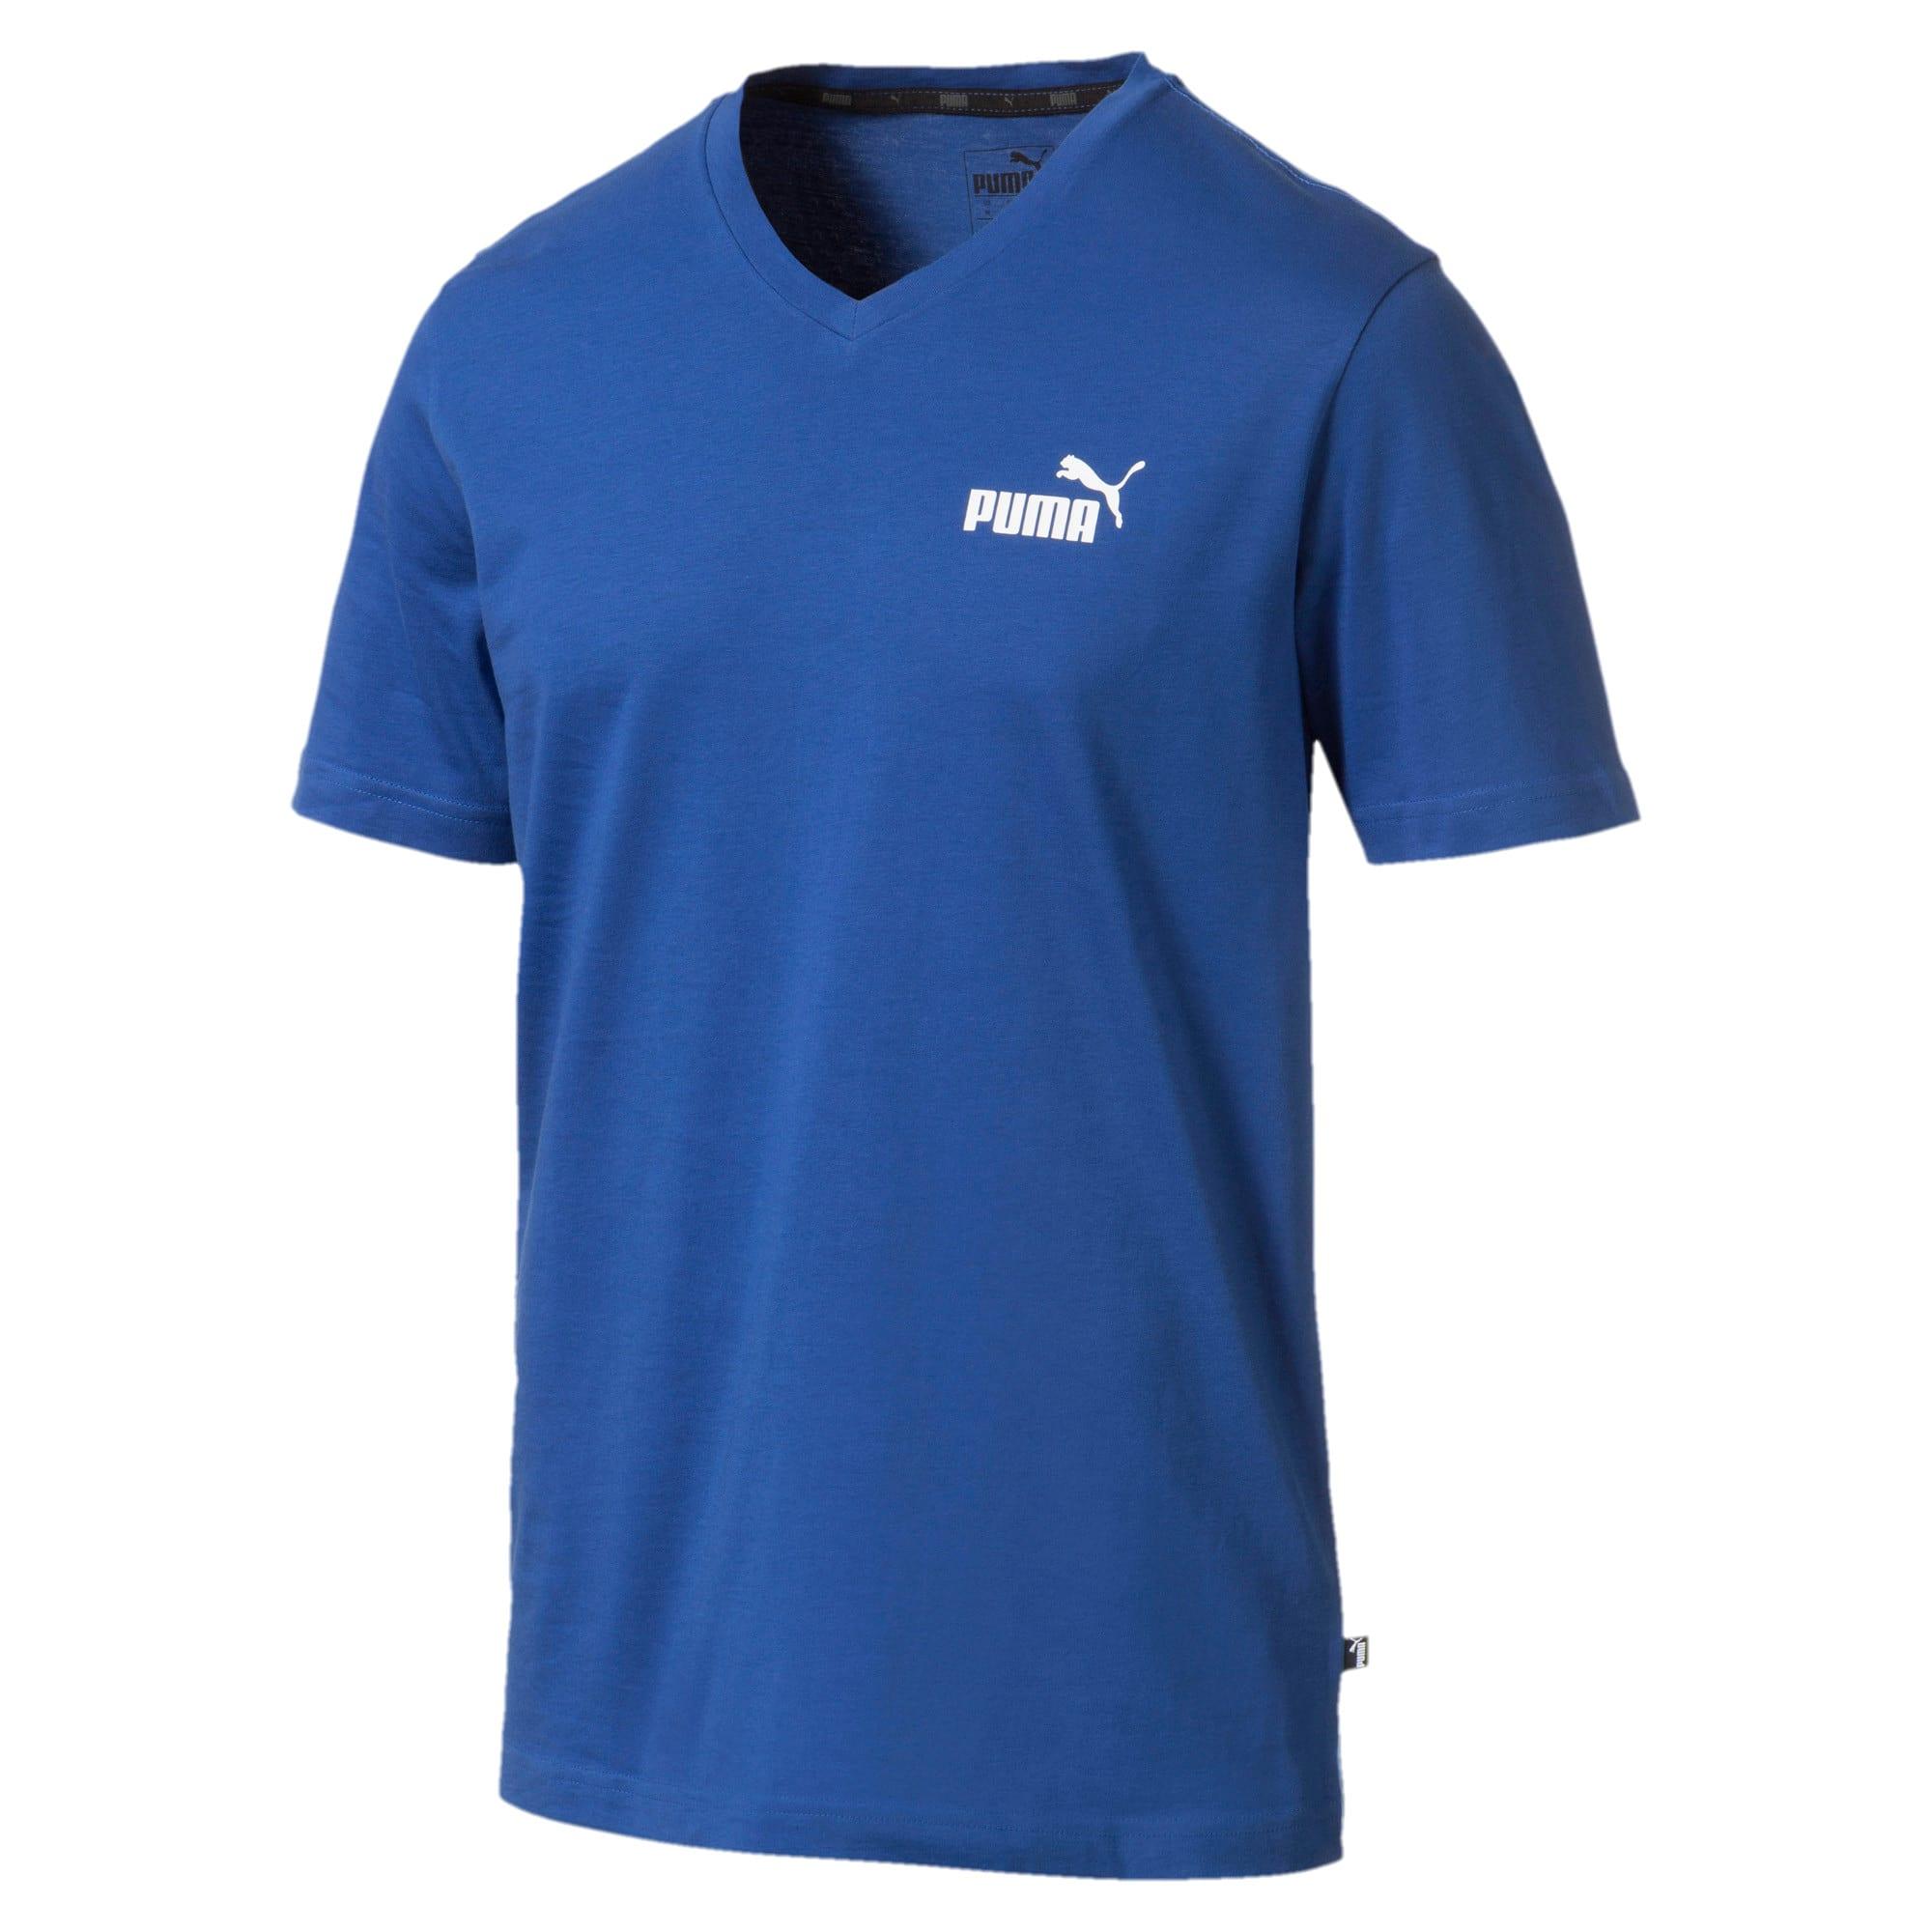 Thumbnail 4 of T-shirt con scollo a V Essentials uomo, Galaxy Blue, medium